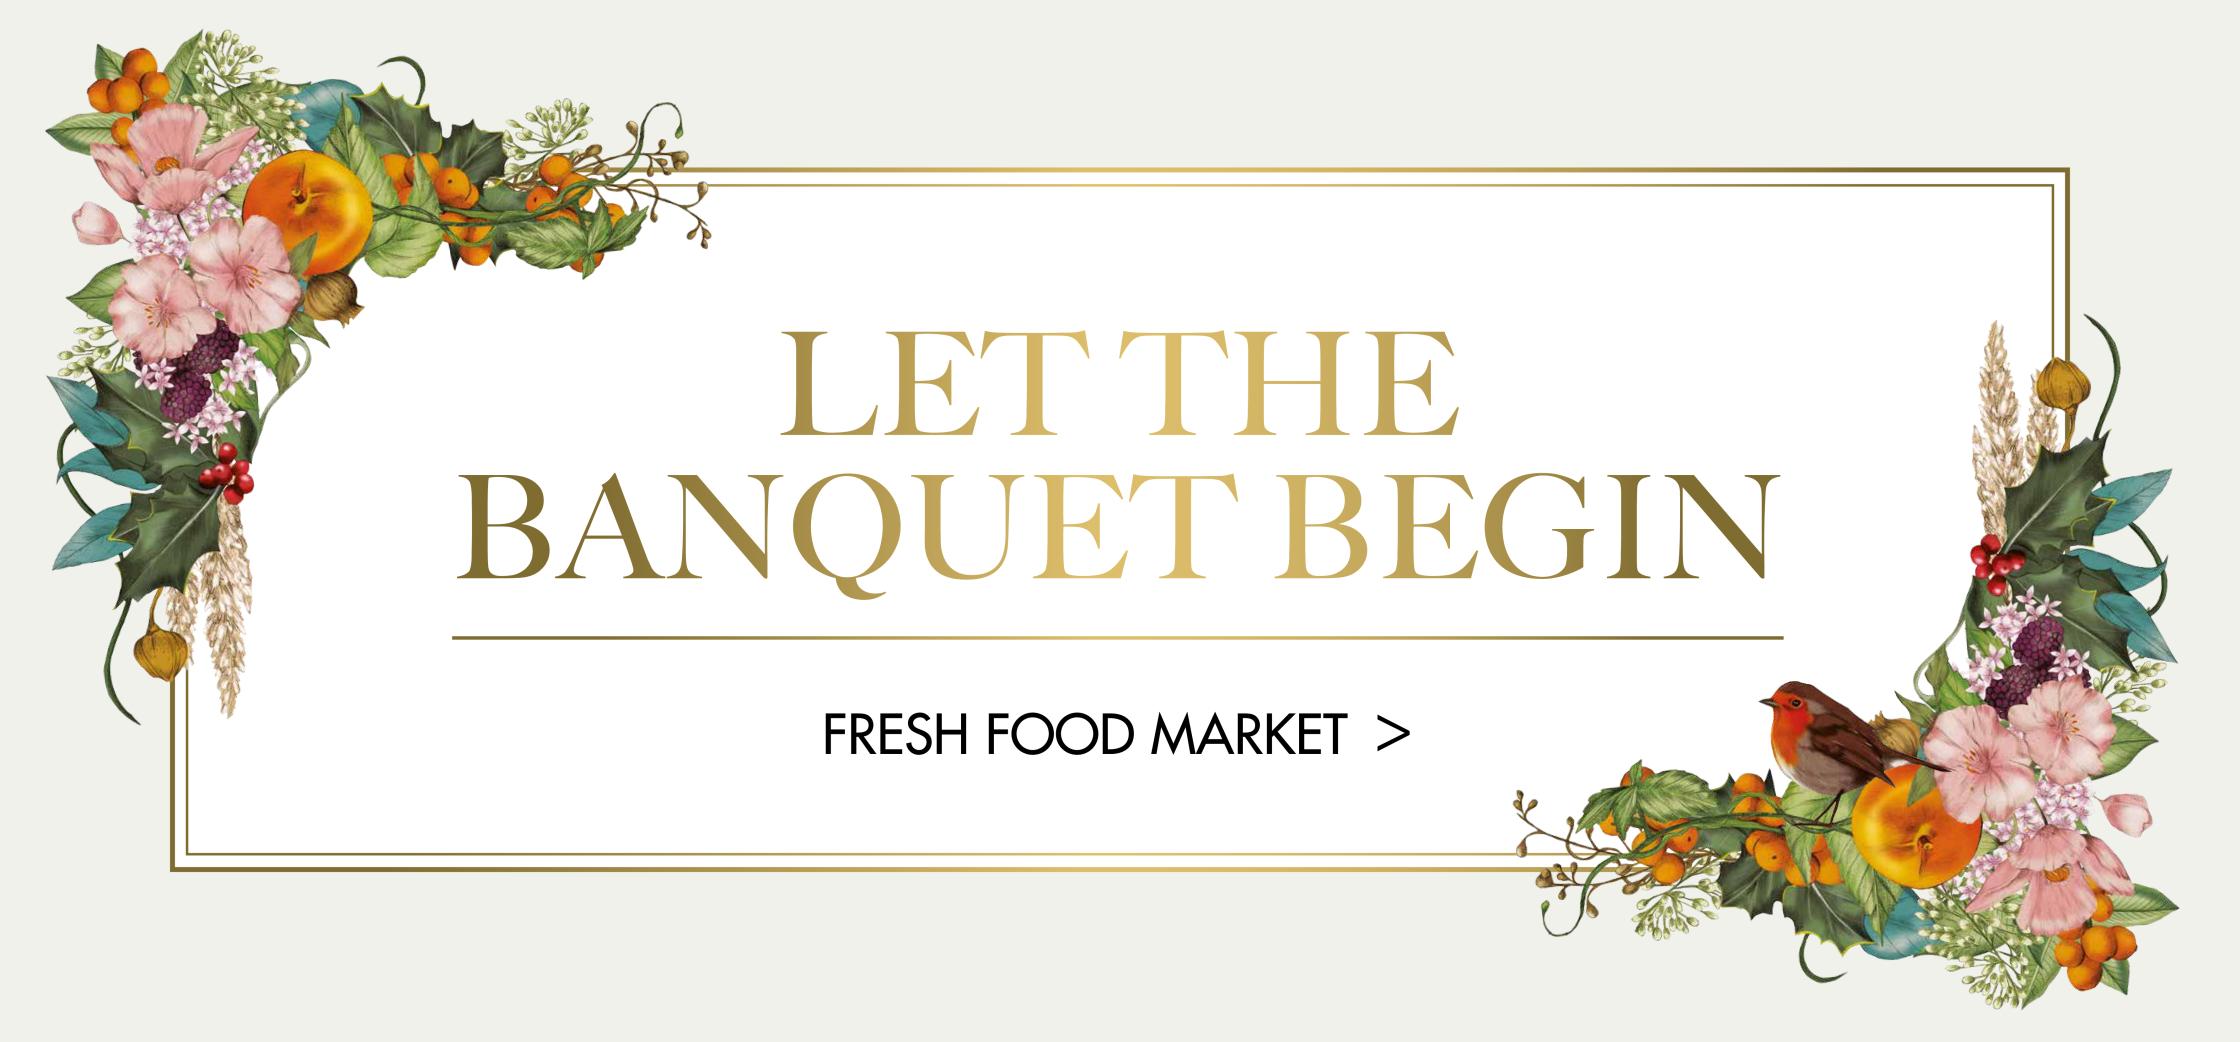 Chapter 2 The Season Fresh Food Web A Feature 1713x797px_FA.jpg